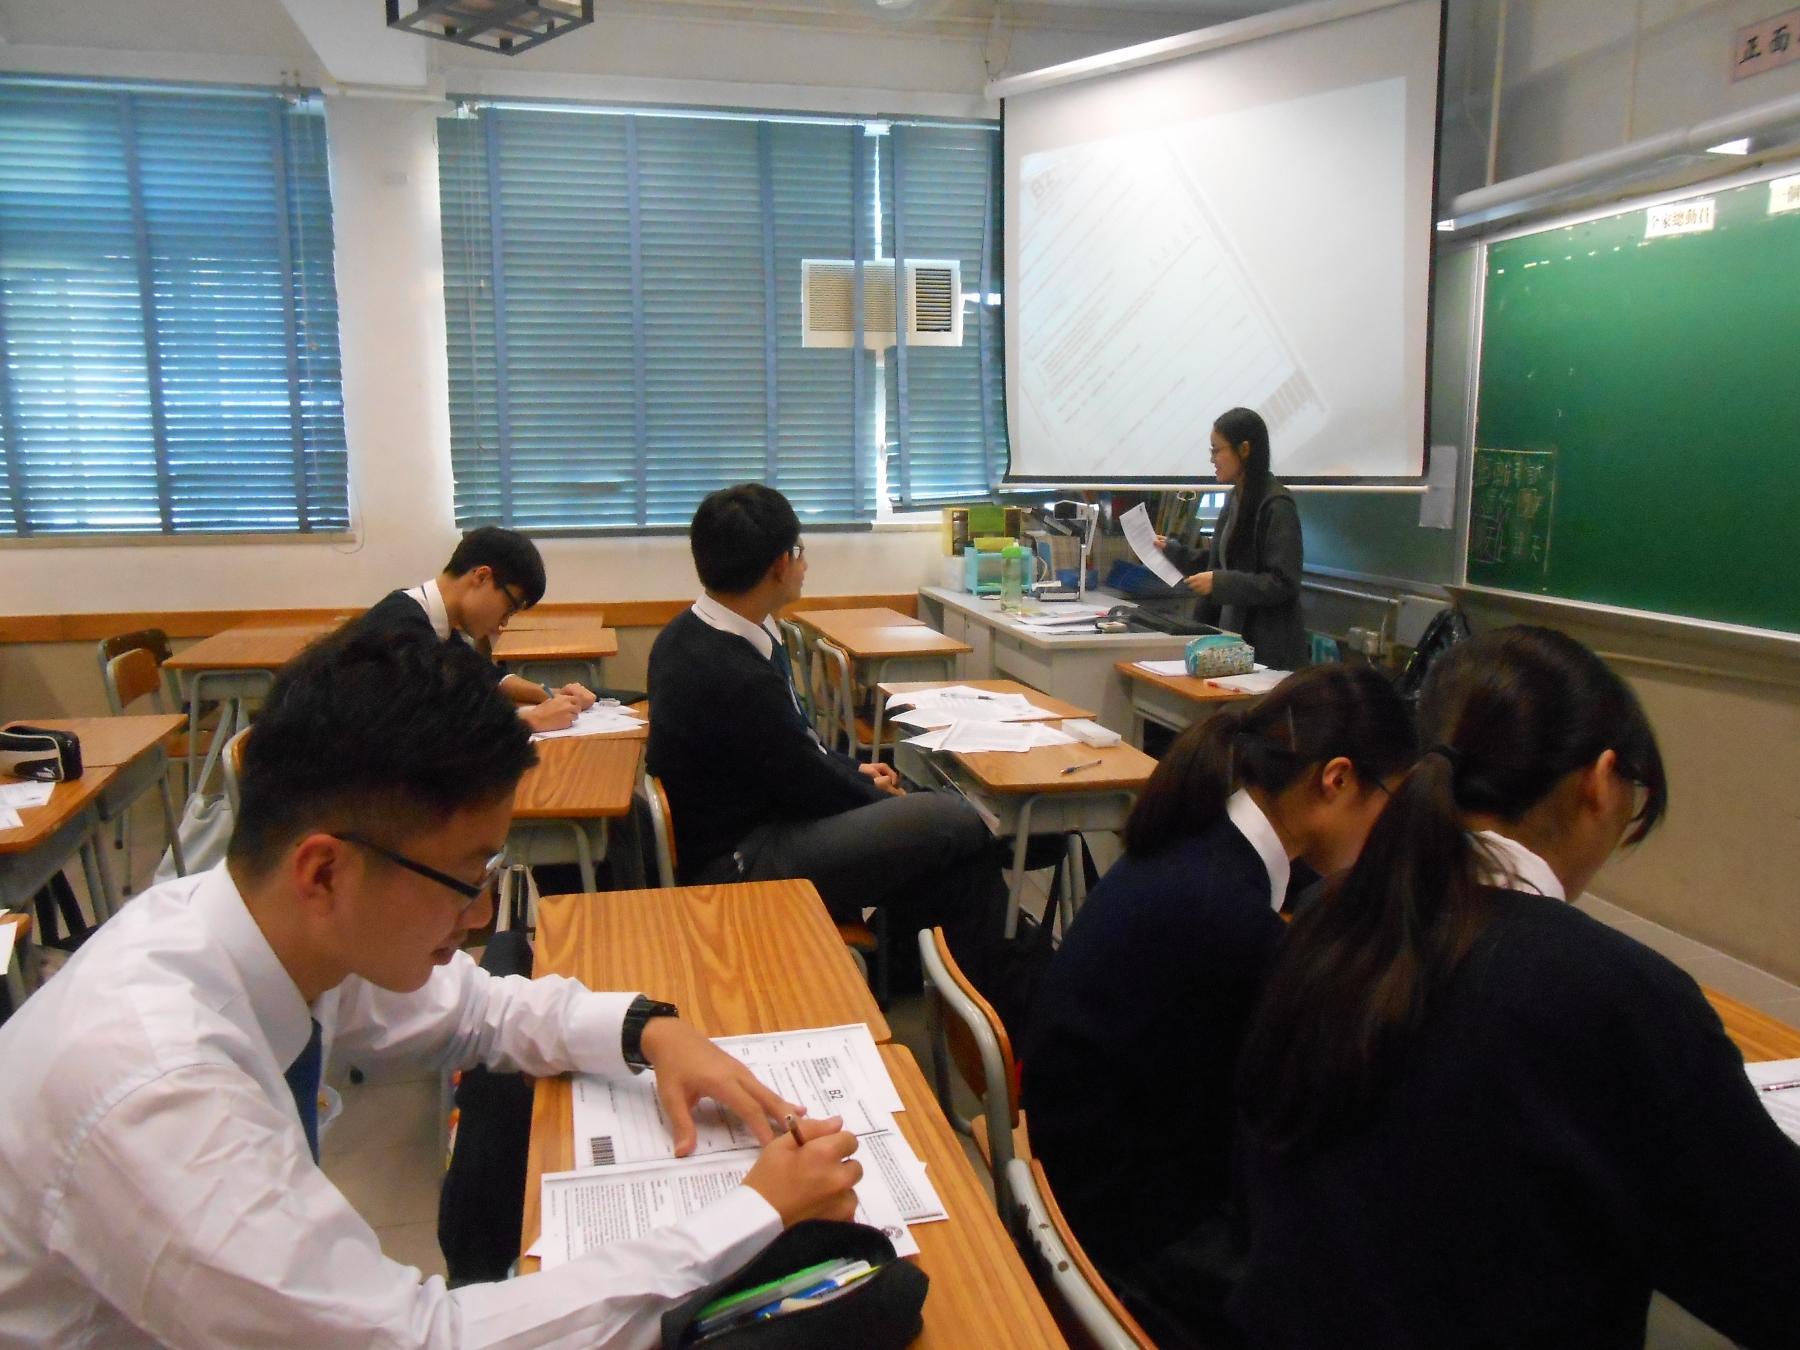 http://www.npc.edu.hk/sites/default/files/dscn9239.jpg